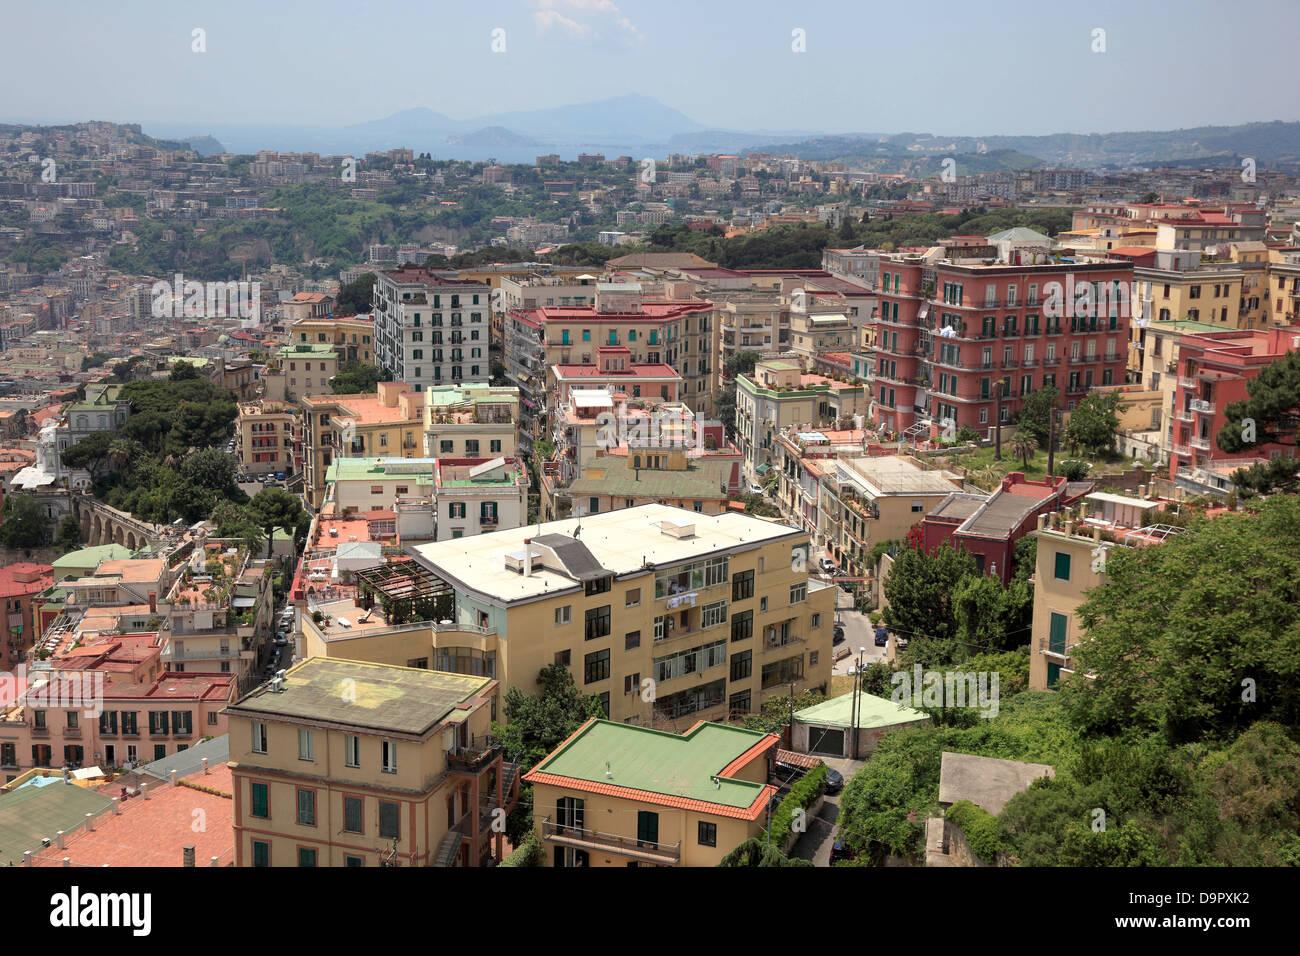 View of Naples, Campania, Italy - Stock Image